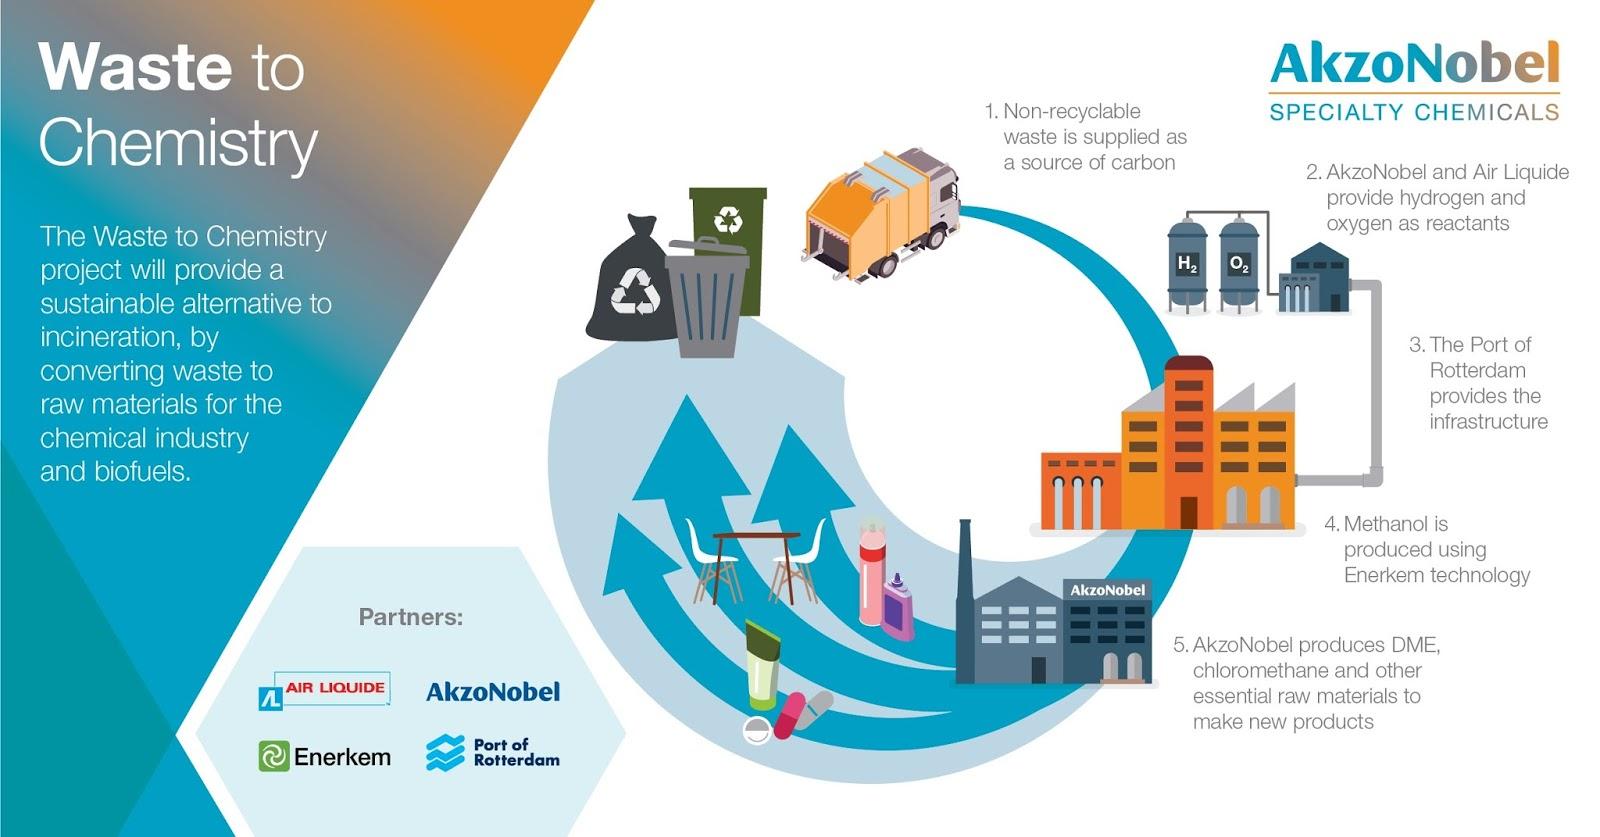 Air Liquide, AkzoNobel, Enerkem and the Port of Rotterdam